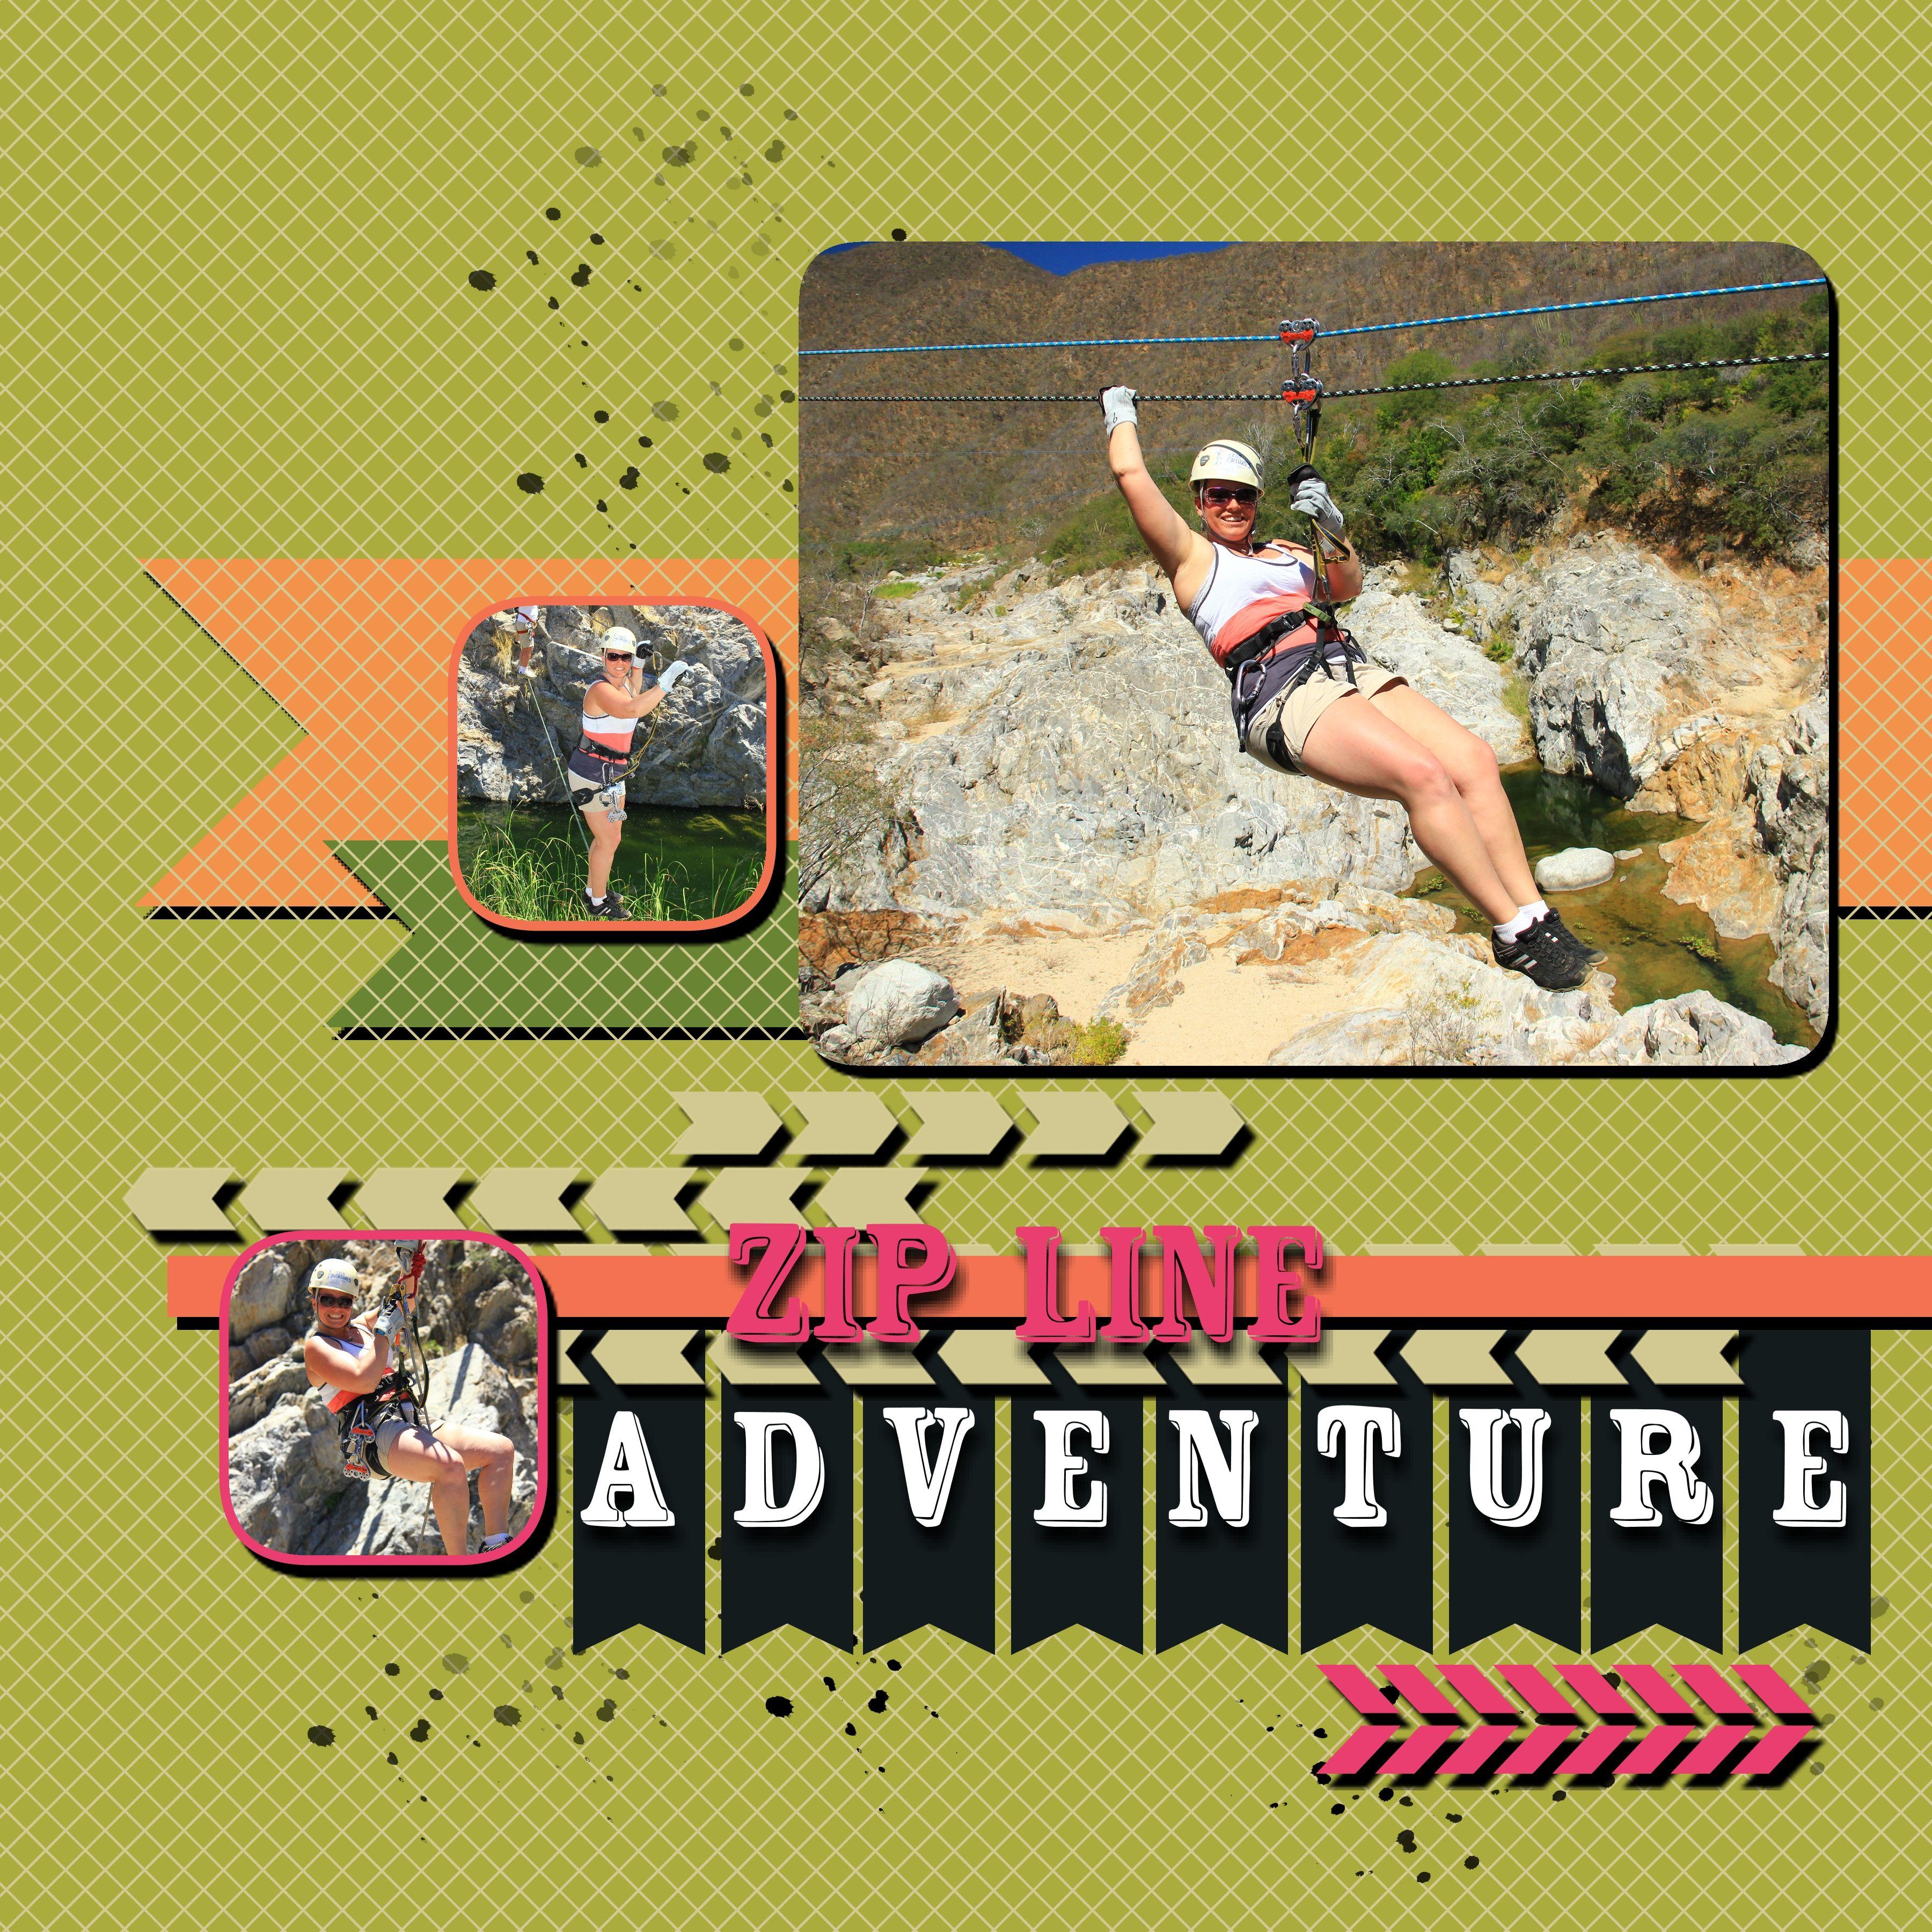 Ziplining scrapbook ideas - Zipline Adventure Page Layout Title